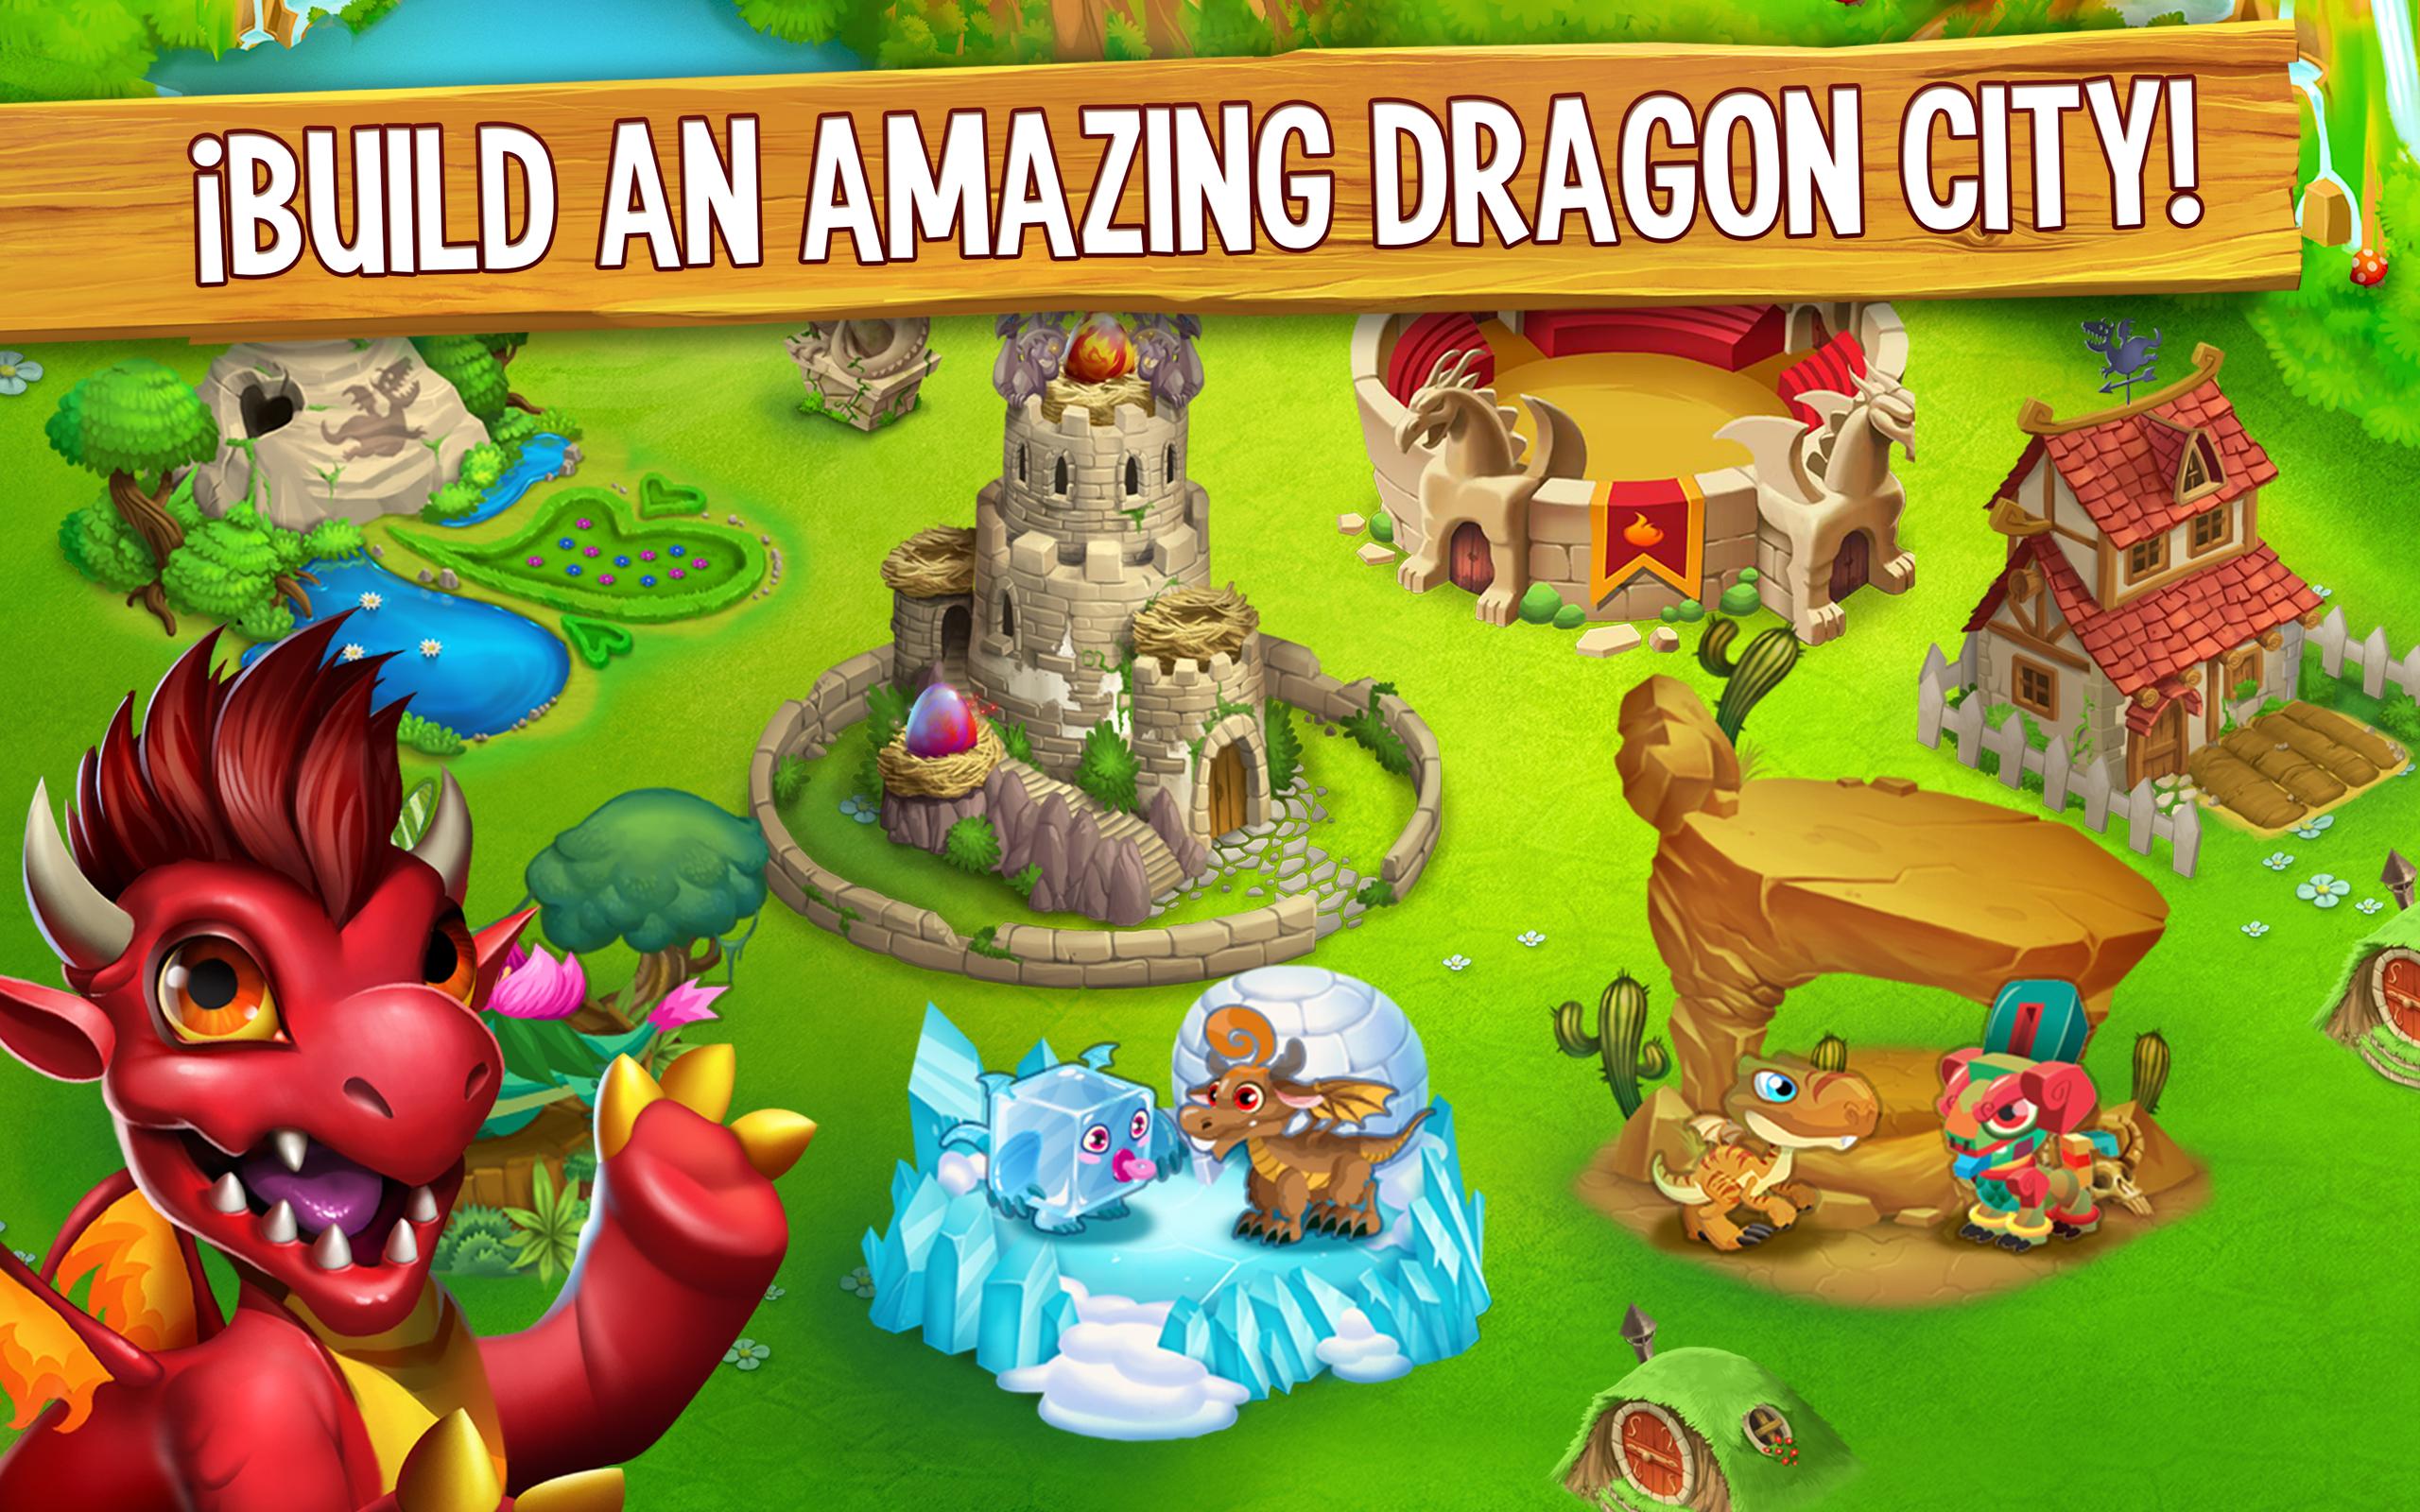 Dragon Ity